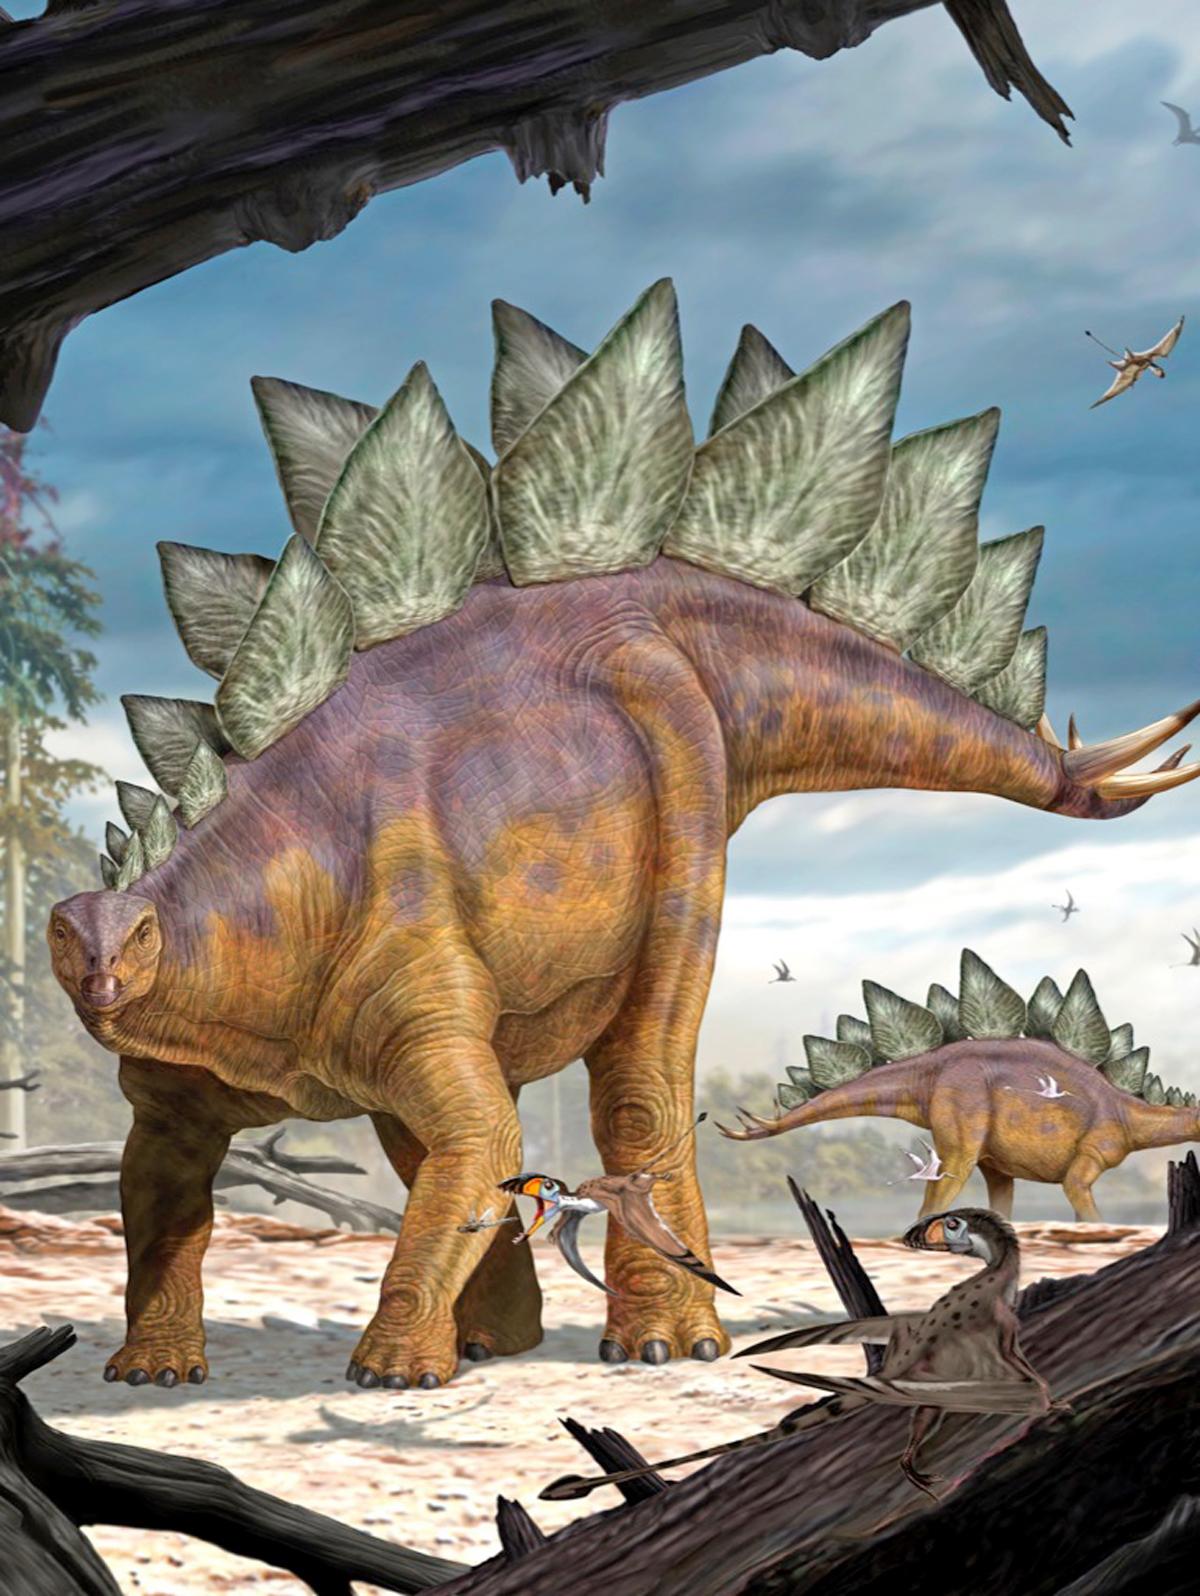 Stegosaurus Dinosaurs Jigsaw Puzzle